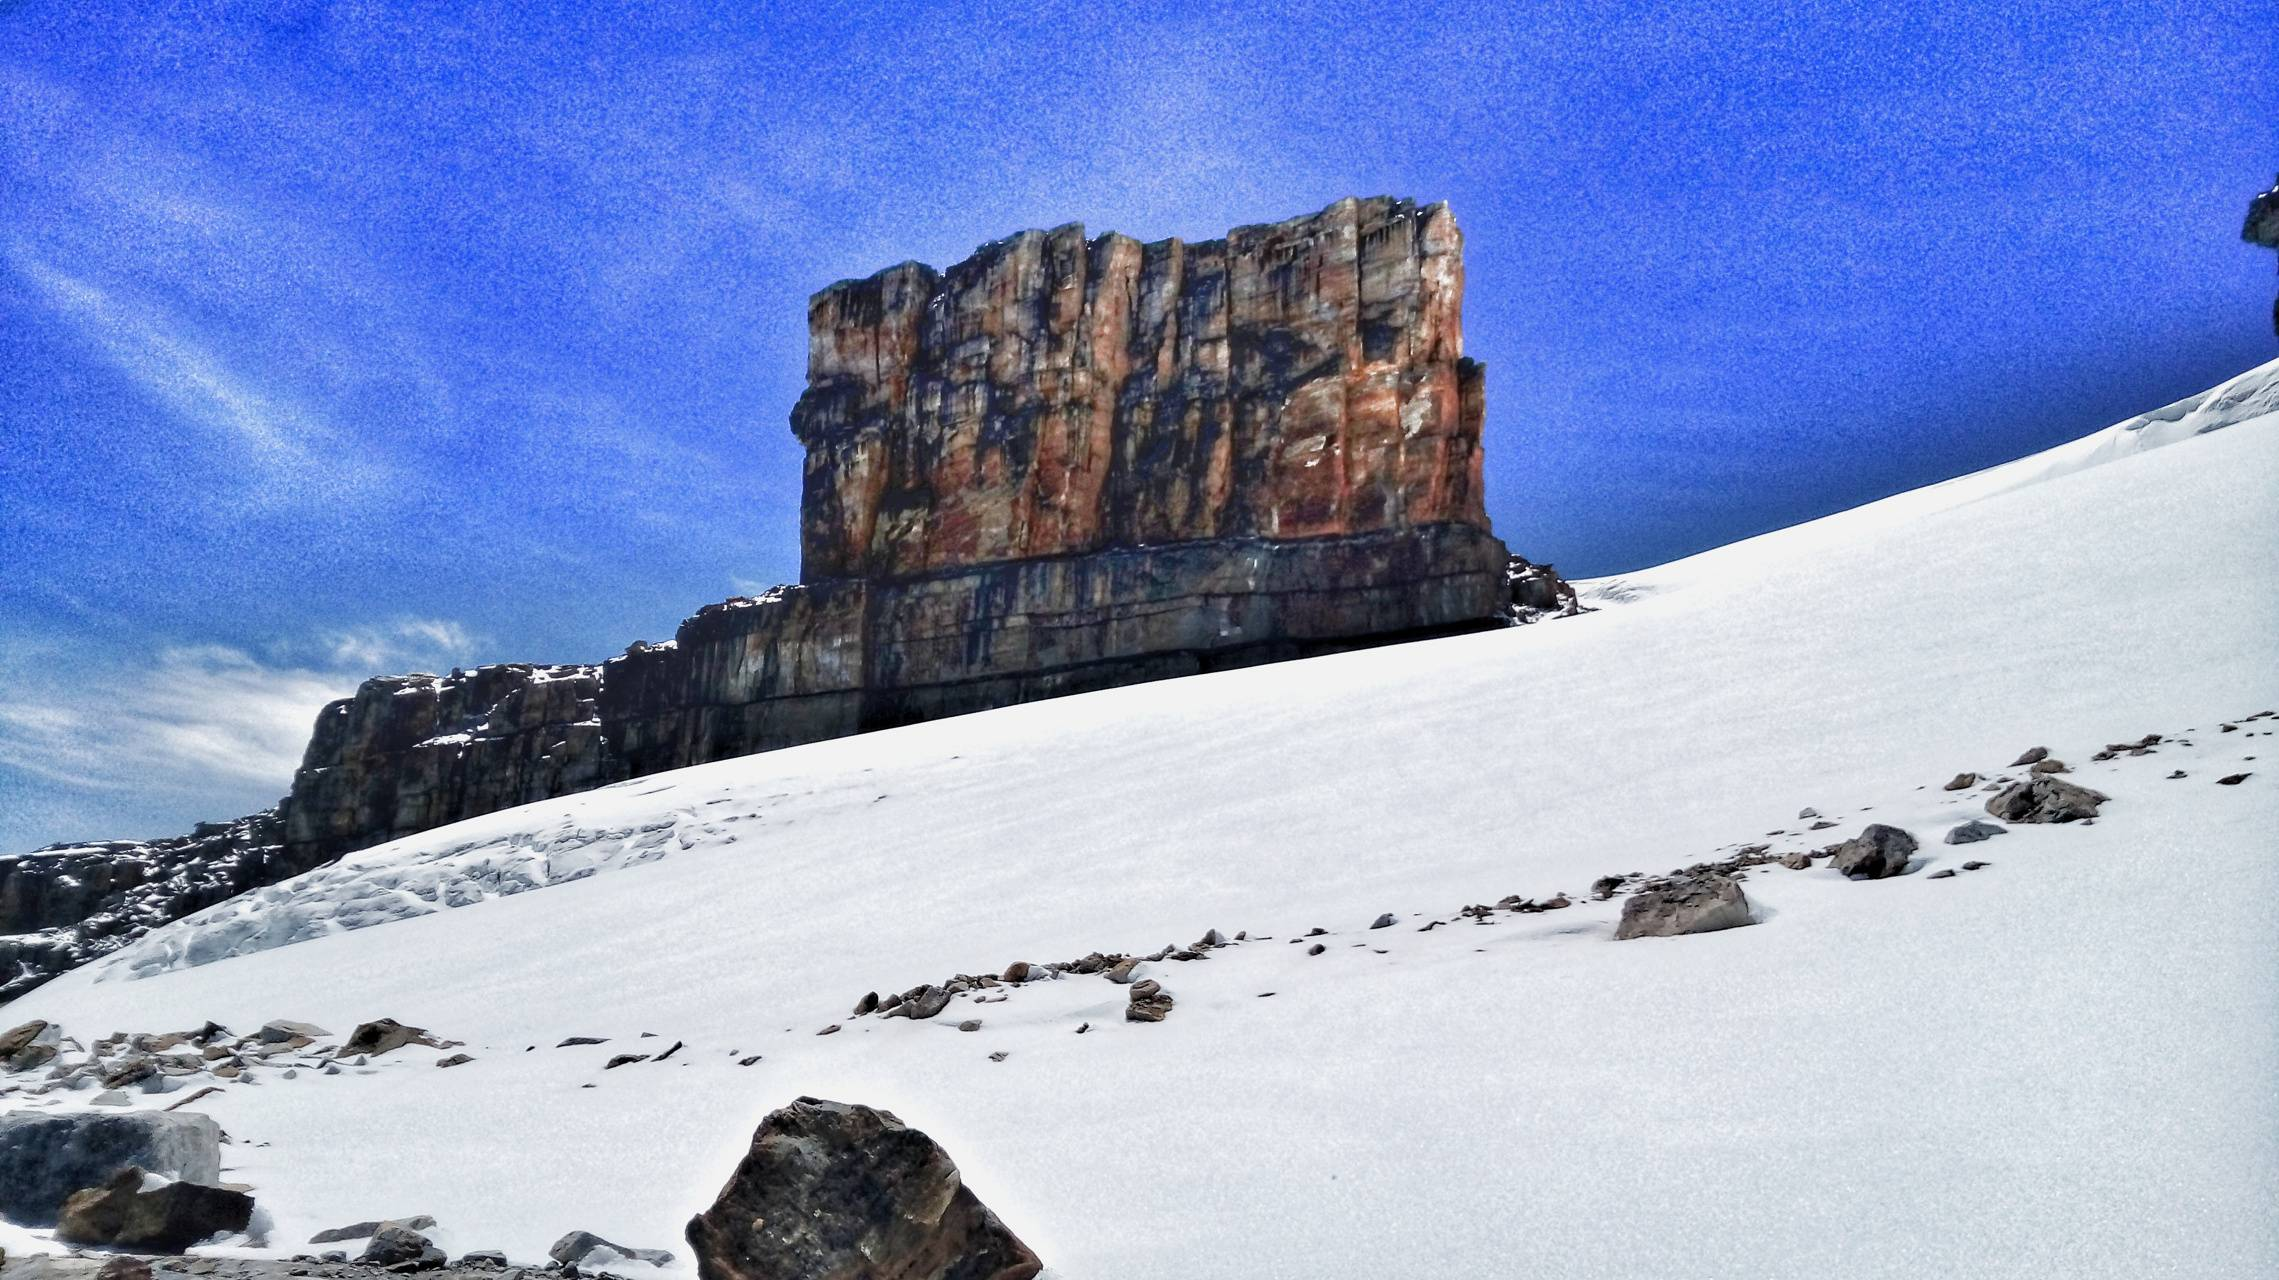 The Sony mountain